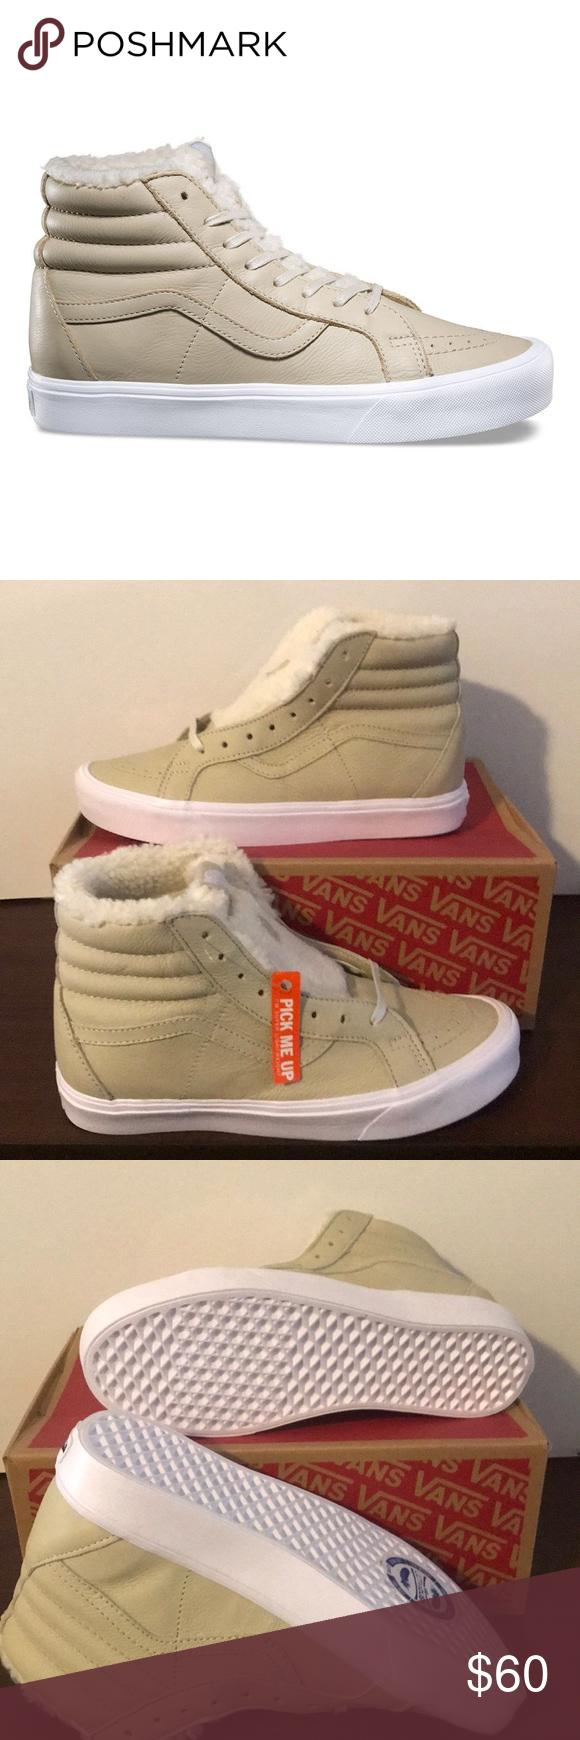 7905cb933e Vans Sk8-Hi Reissue Lite(Men) Vans Sk8-Hi Reissue Lite Sherpa Cement True  White Vans Shoes